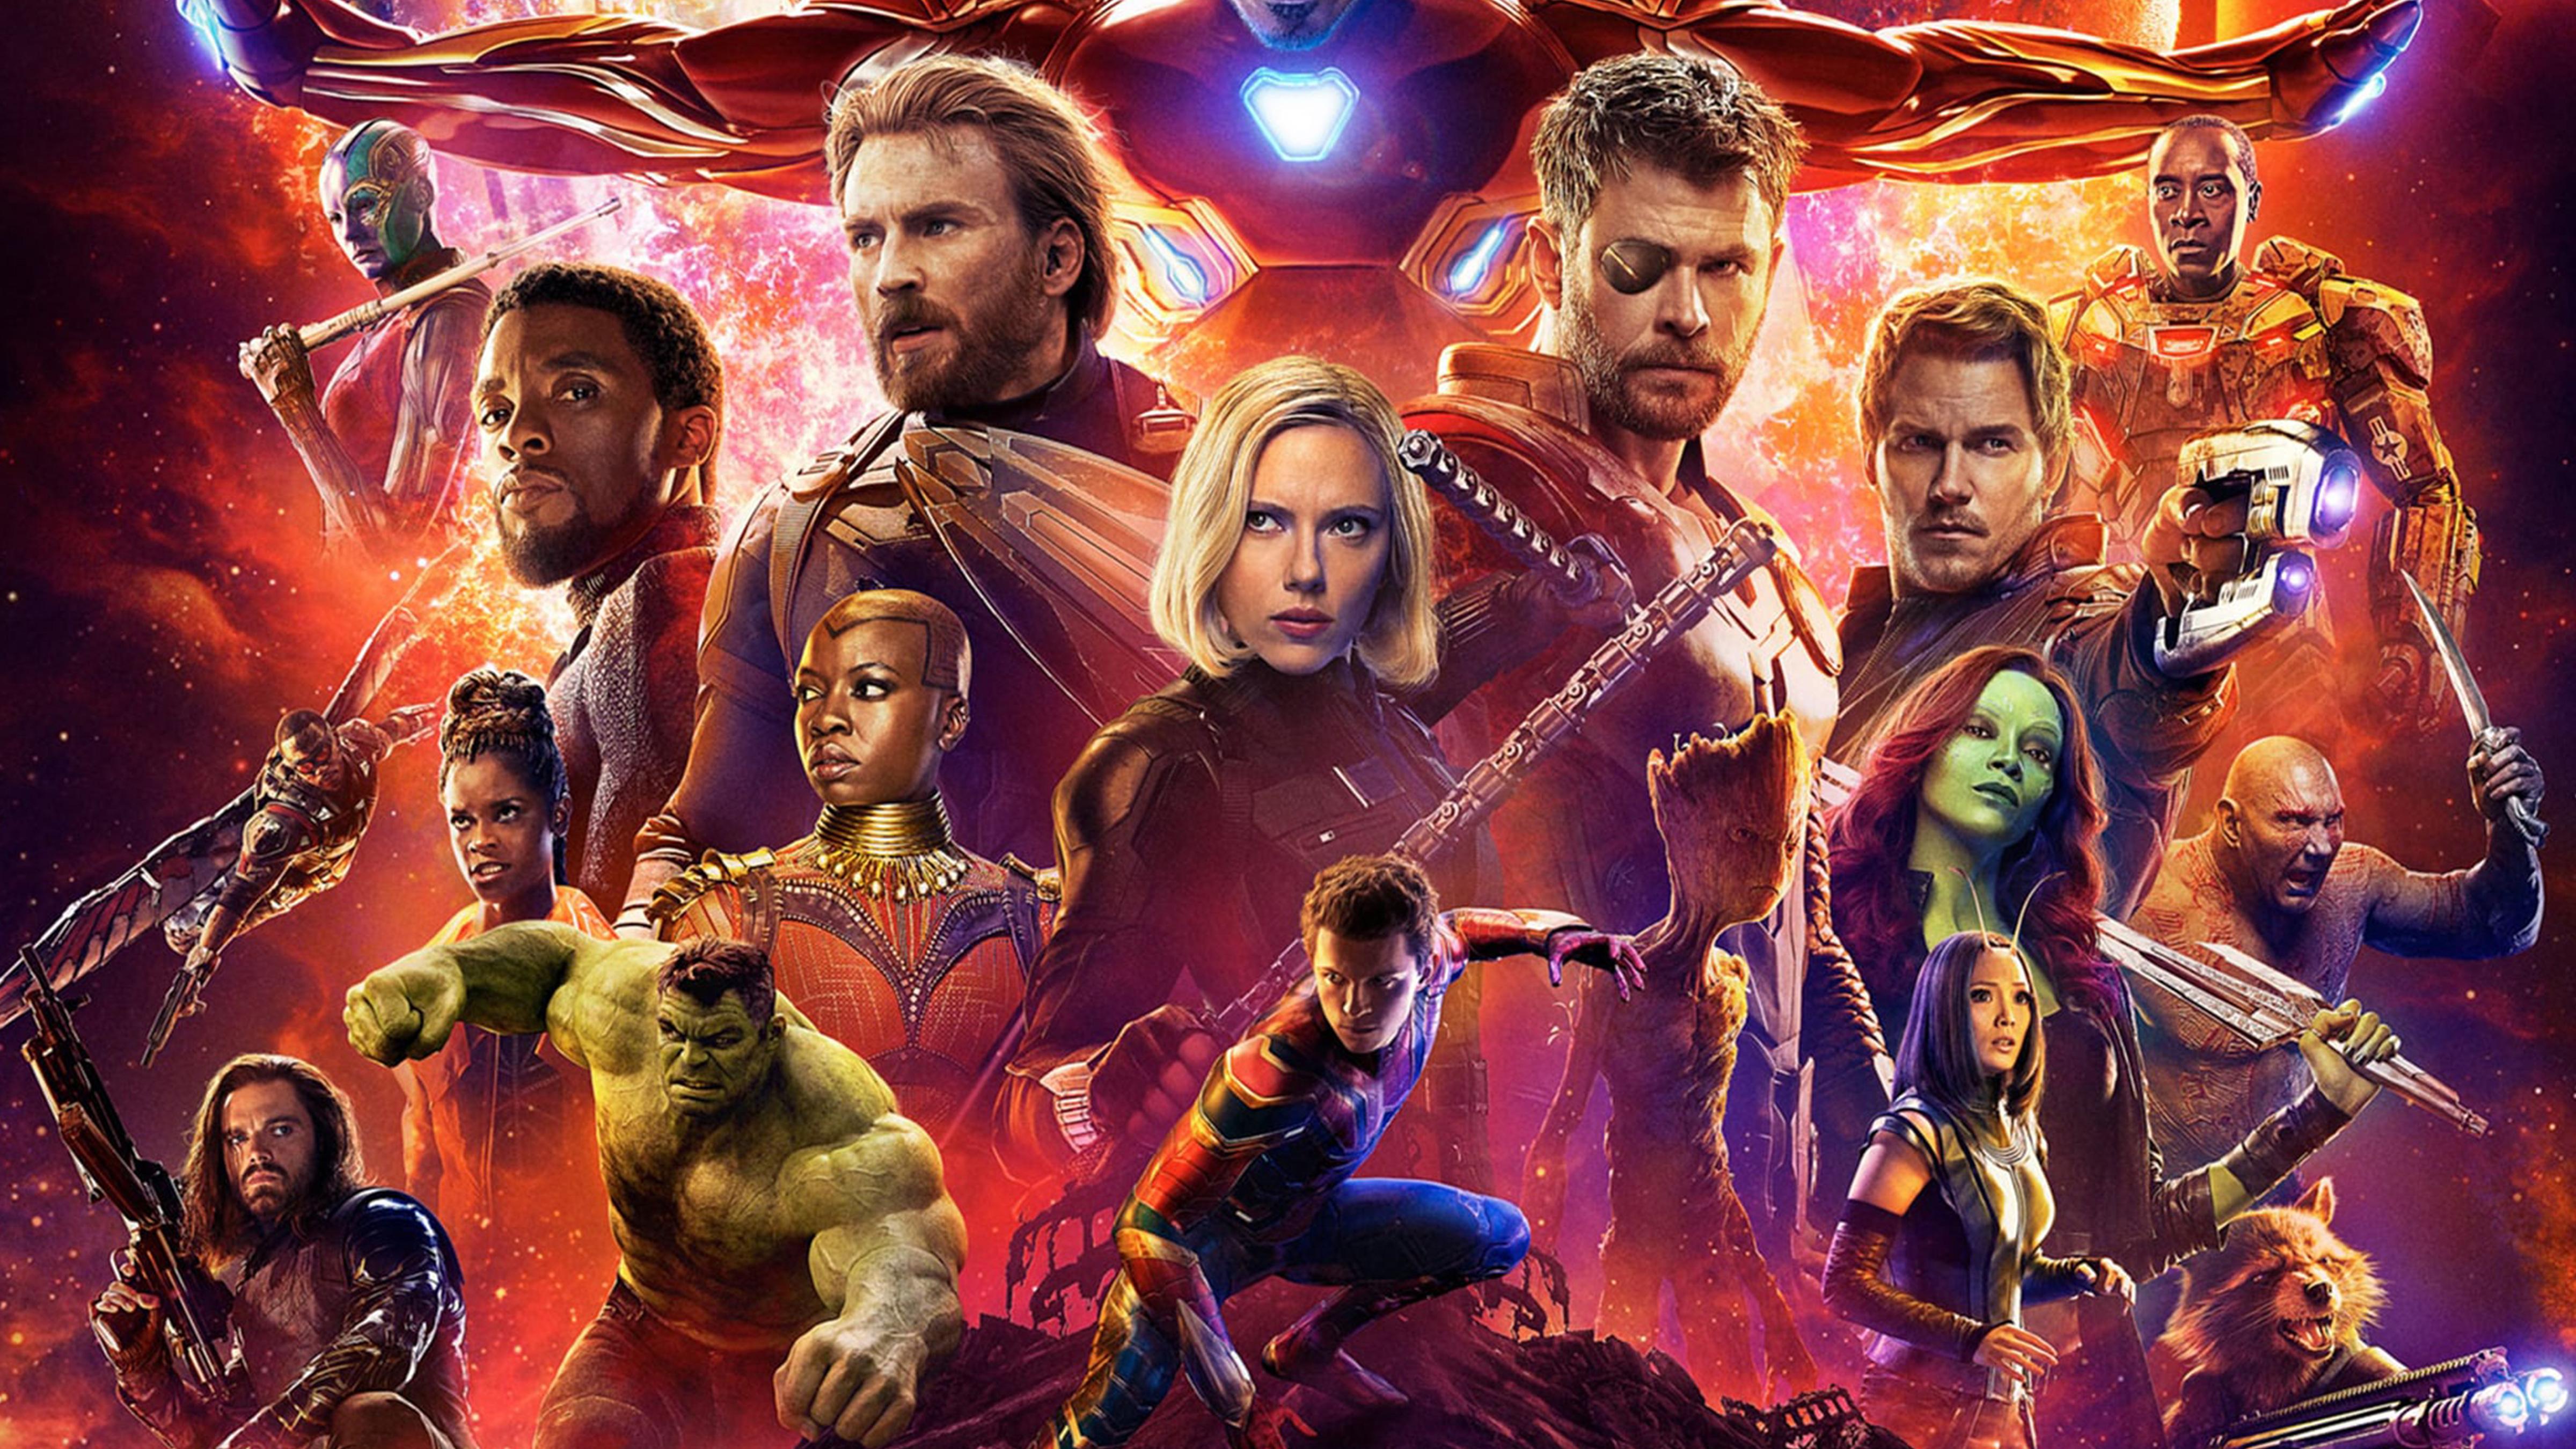 Avengers Infinity War 2018 Poster 4k, HD Movies, 4k